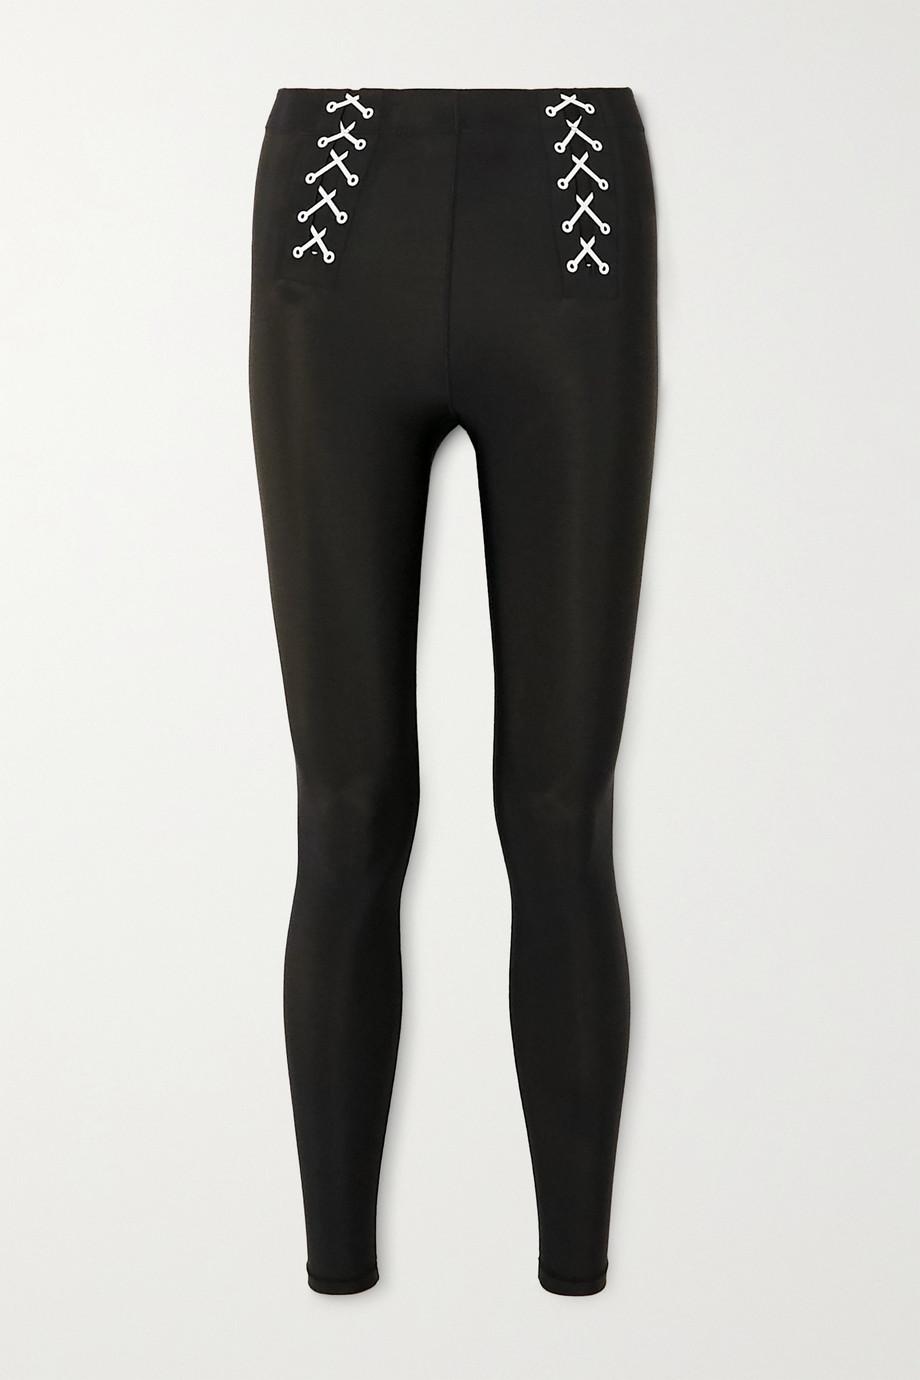 Adam Selman Sport Lace-up stretch leggings